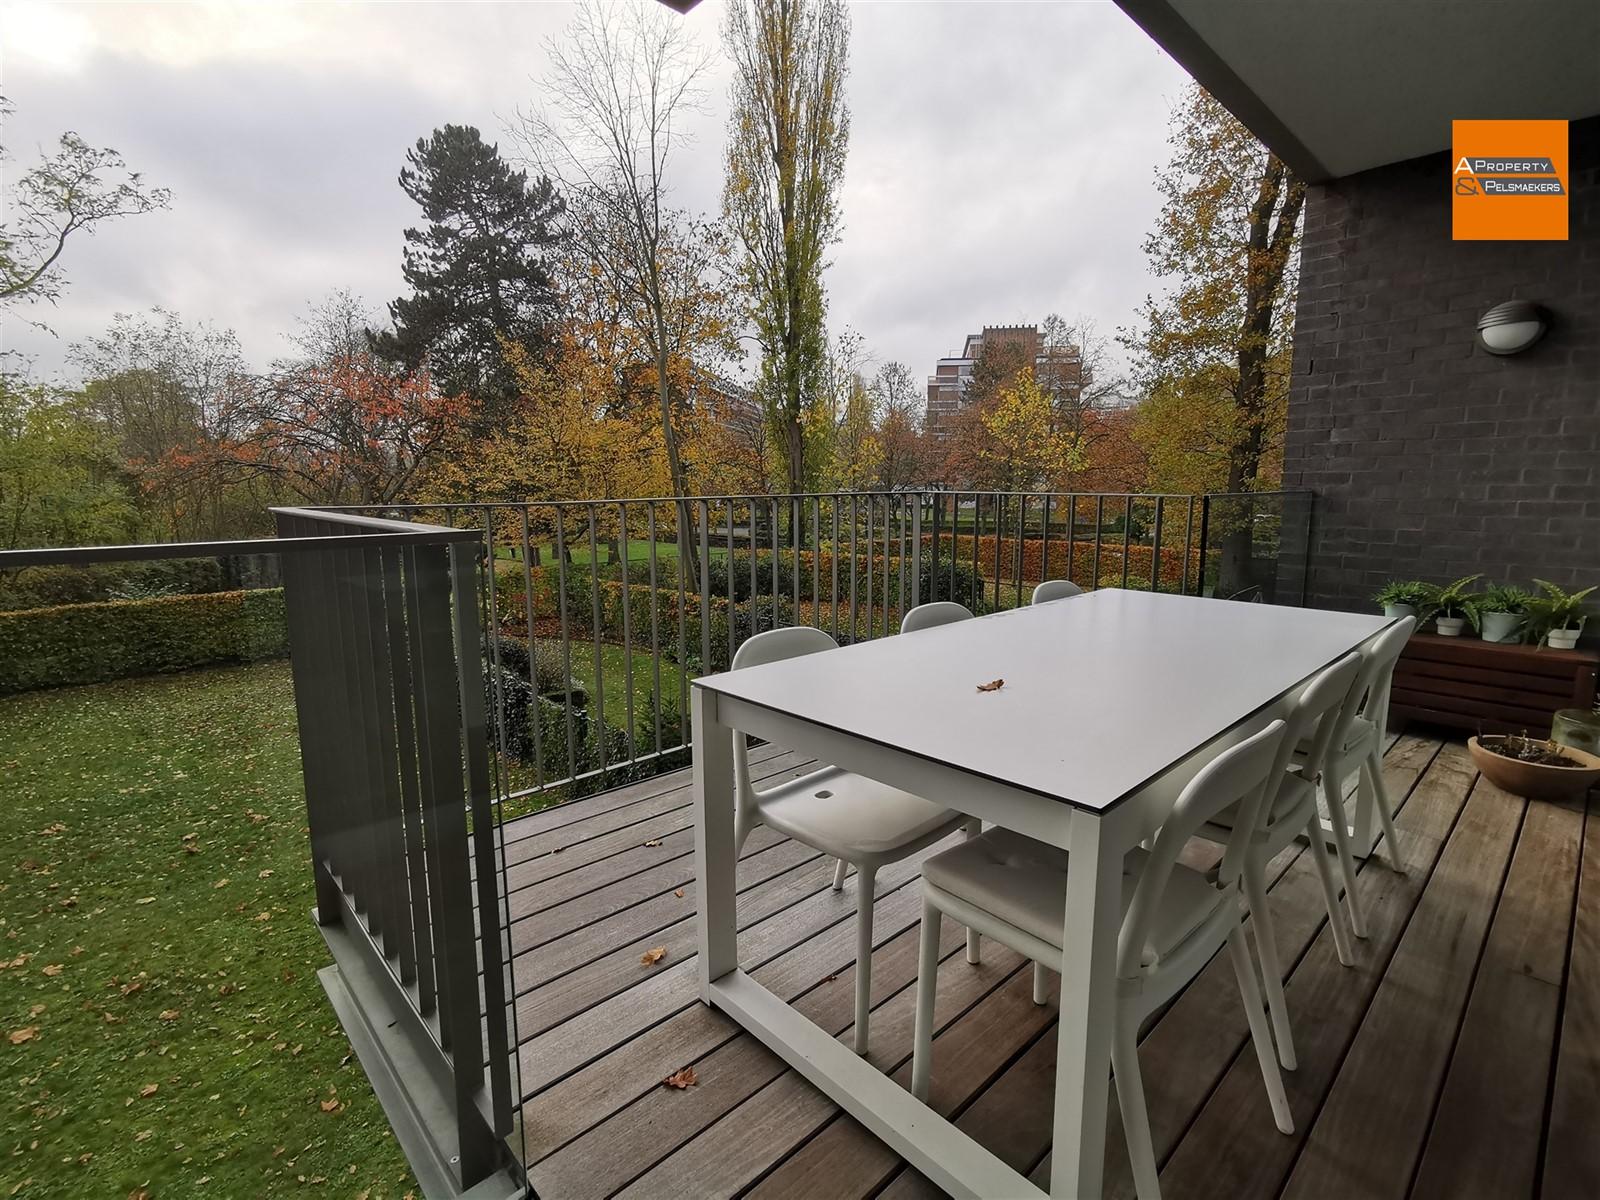 Foto 12 : Gemeubeld appartement in 1050 ELSENE (België) - Prijs € 1.500